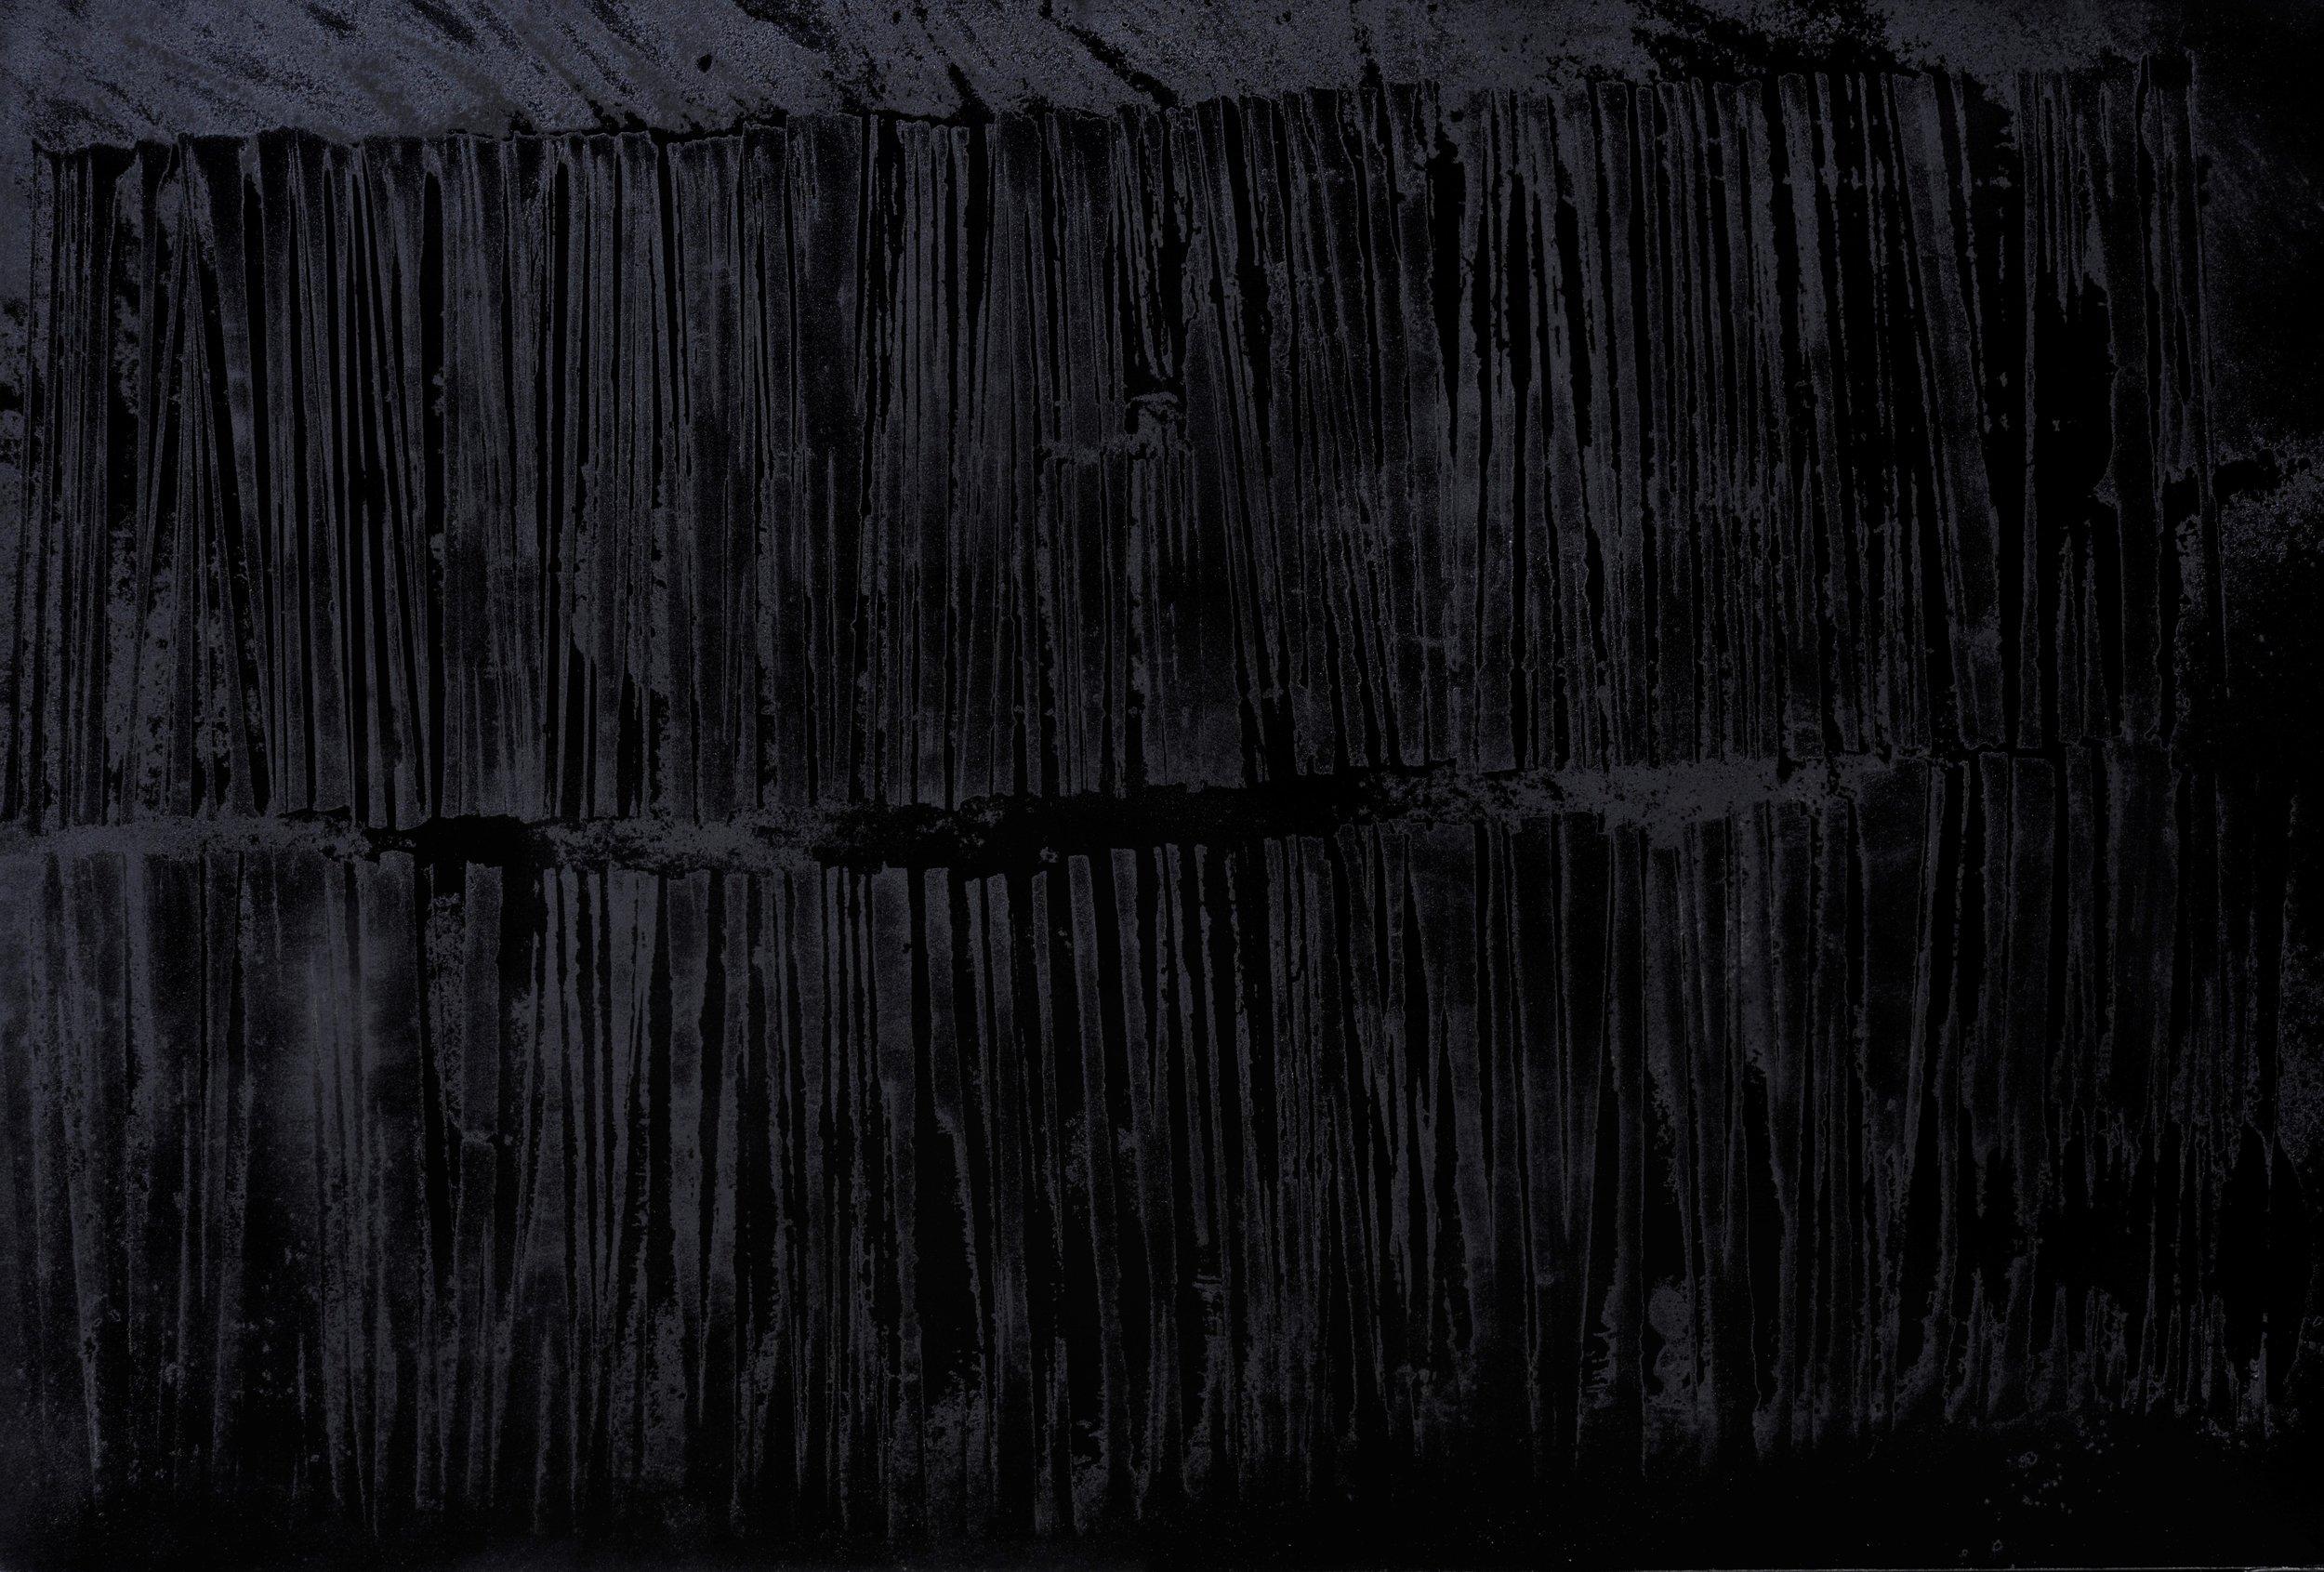 Black Void No. 5, 2016, 194cm x 130cm 120F, Oil on Canvas.jpg